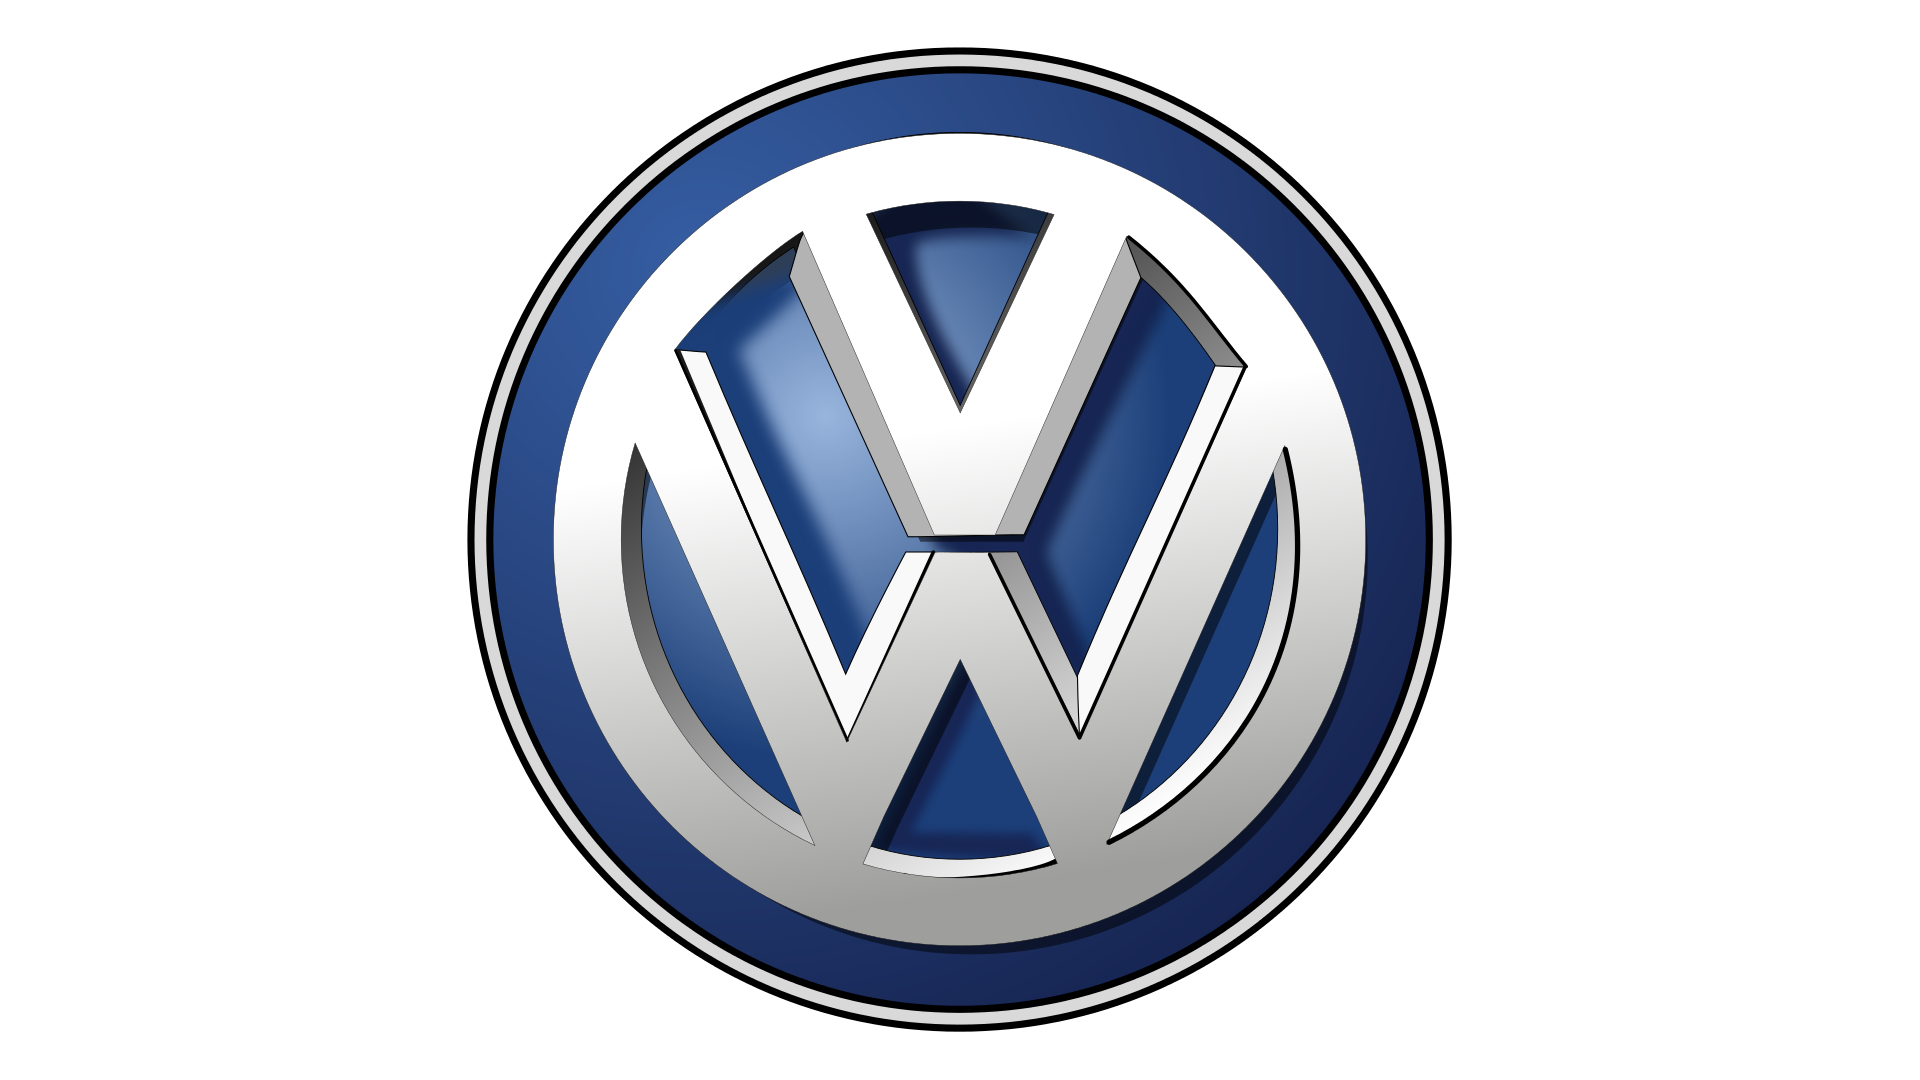 1920x1080 Car Logos, Car Company Logos, List Of Car Logos